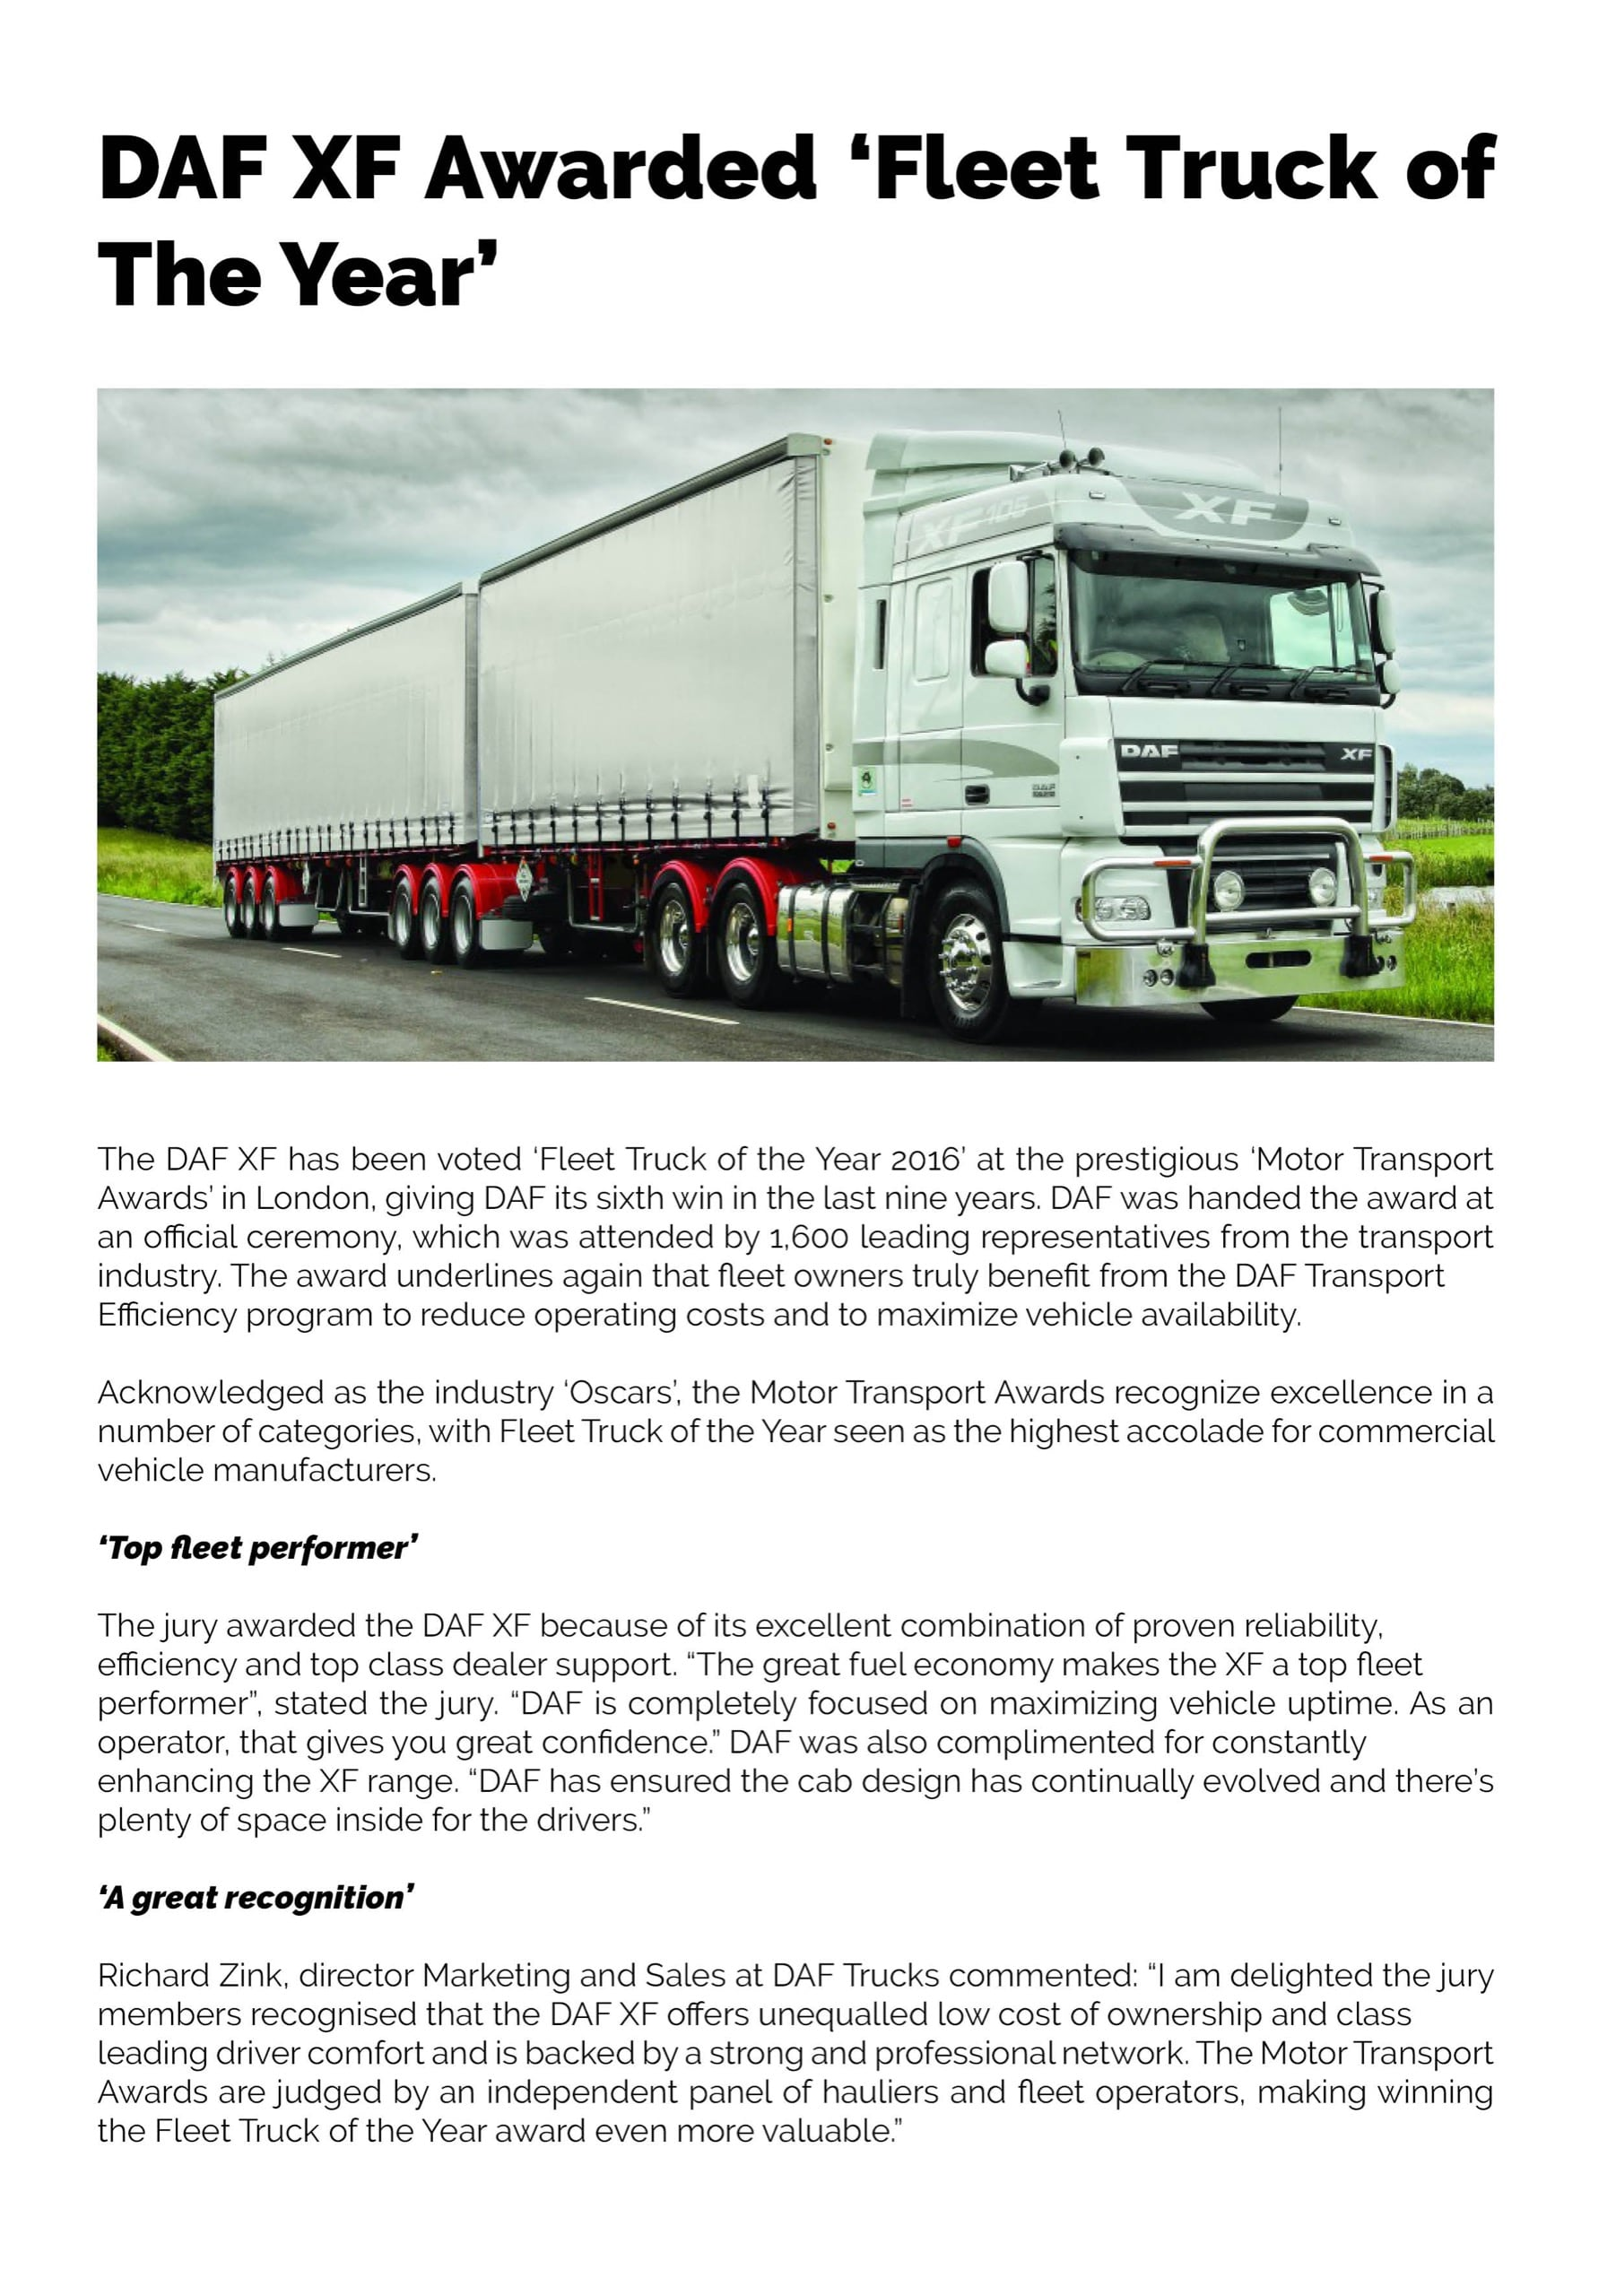 DAF XF Awarded Fleet Truck of the Year